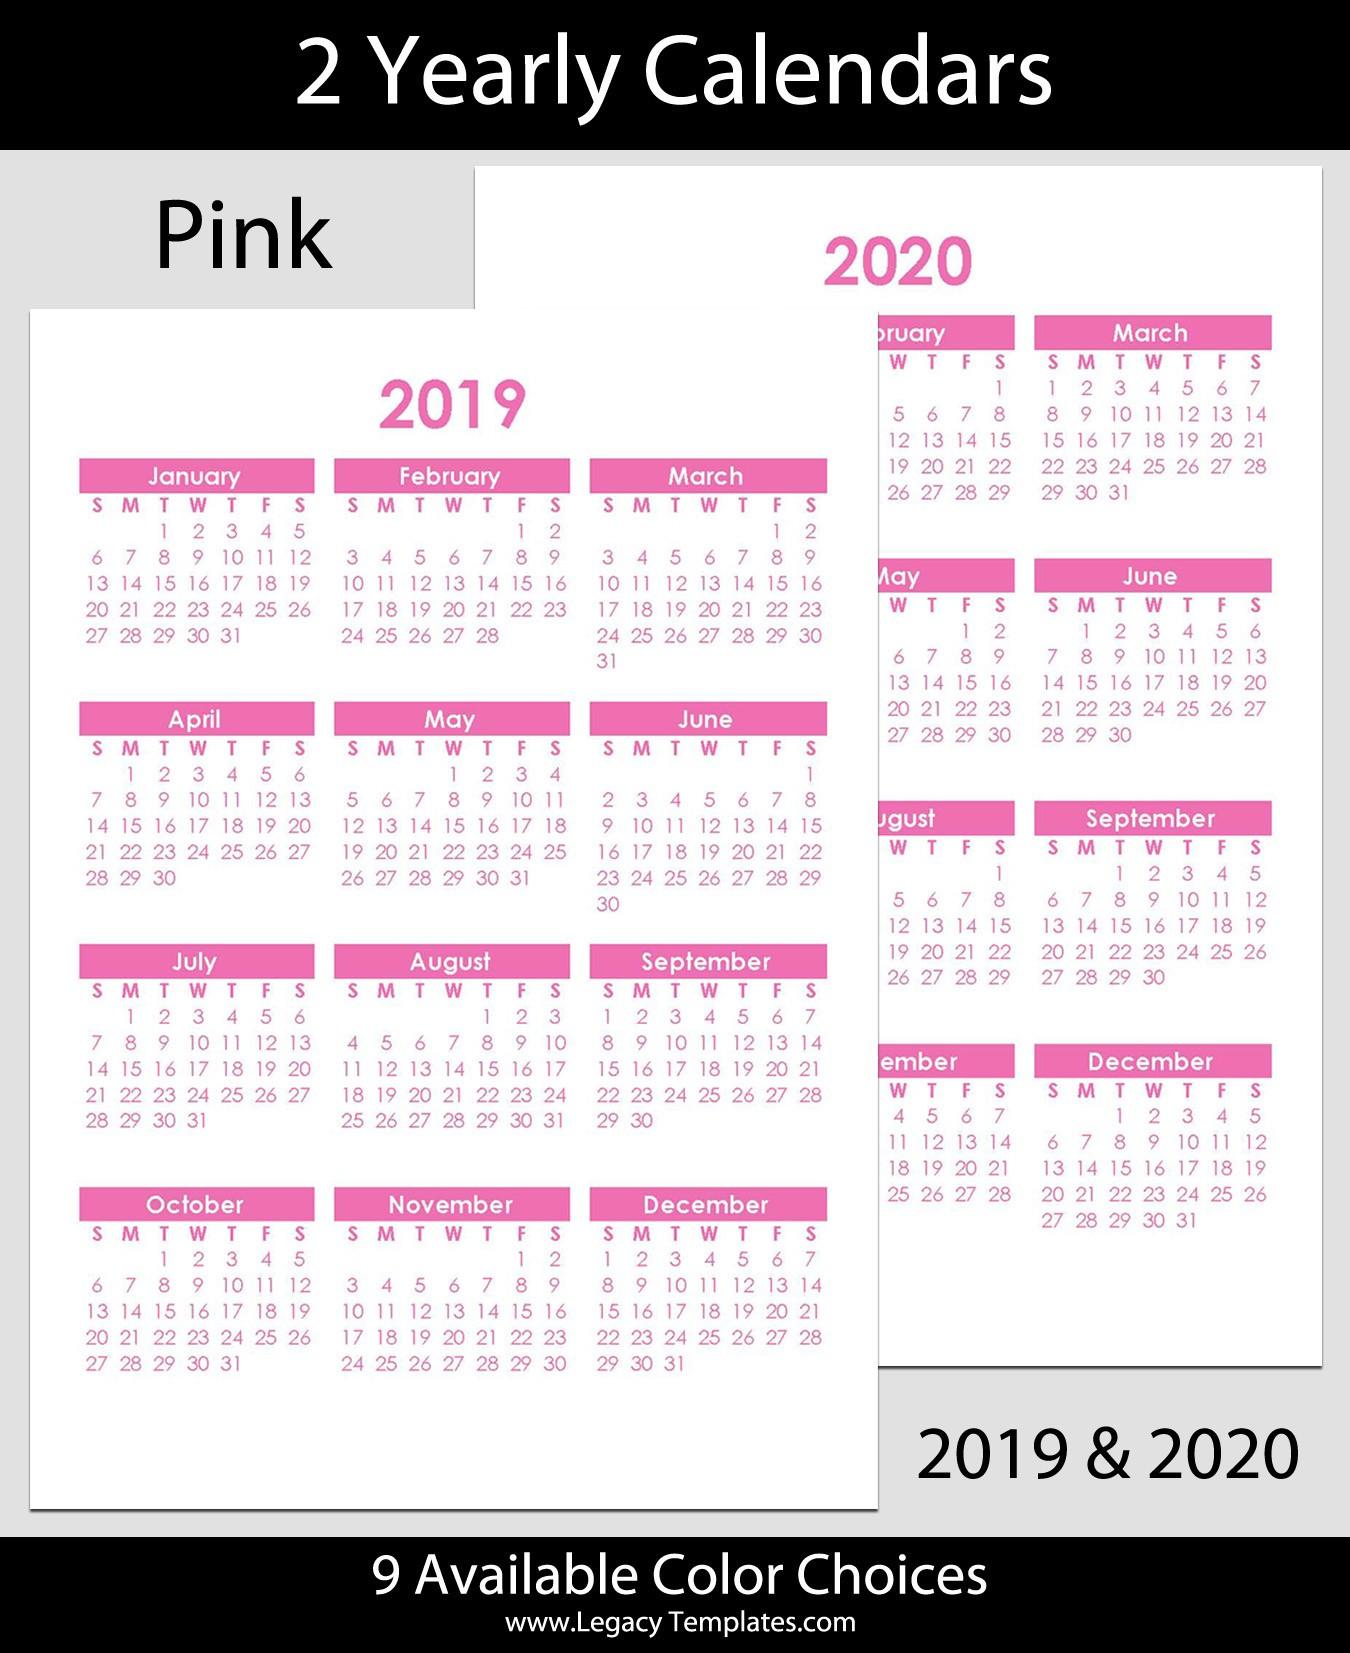 2019 & 2020 Yearly Calendar – A5